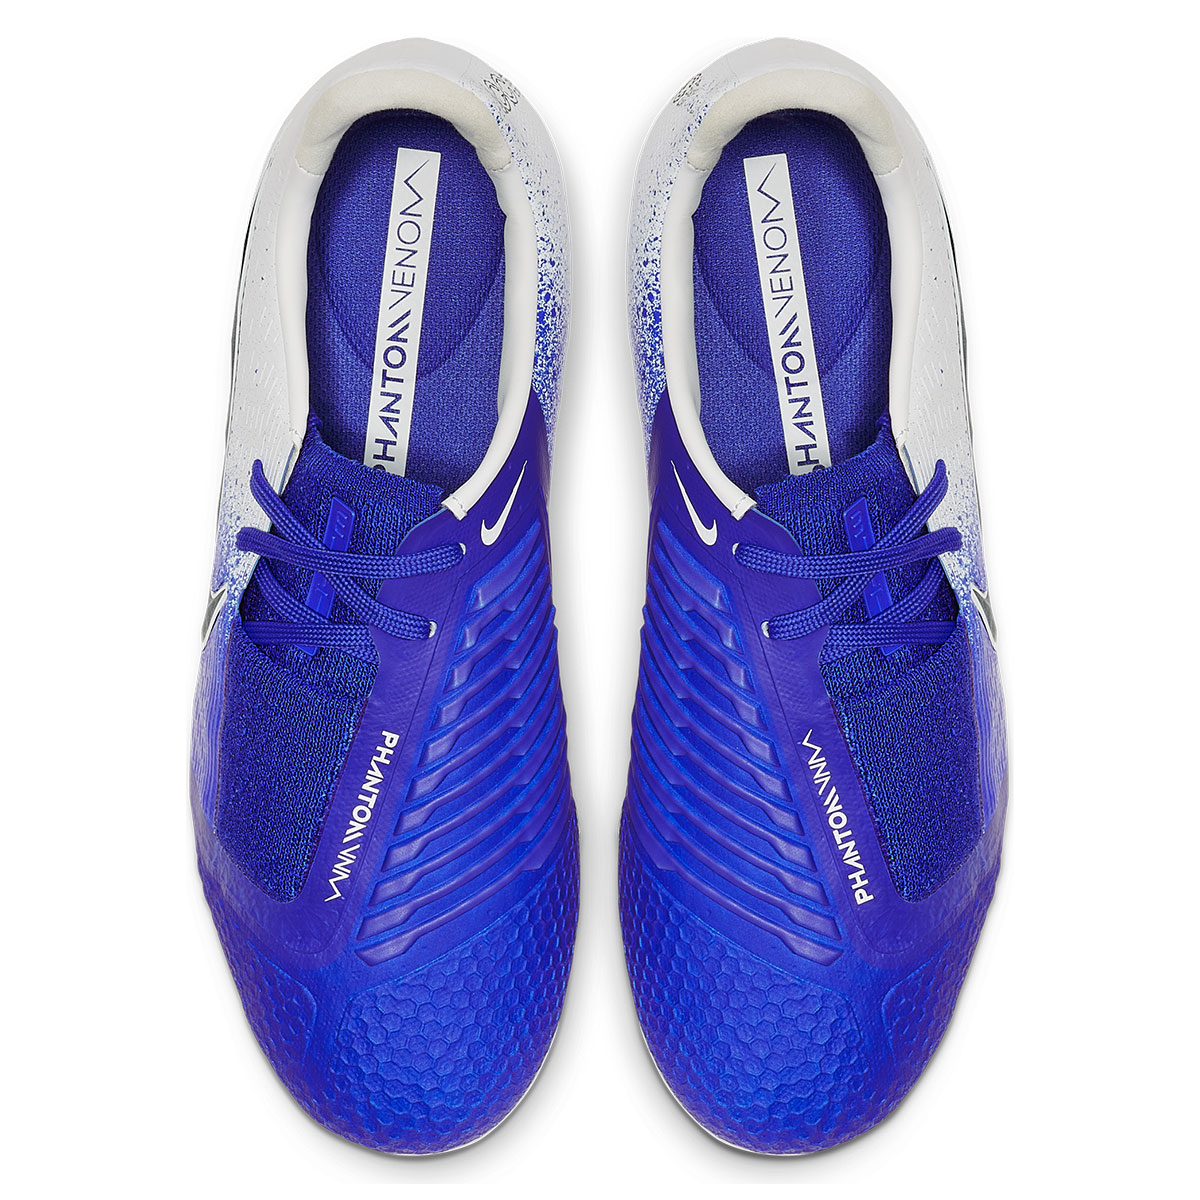 32cc1df33e4 Nike kinderen voetbalschoenen Phantom Venom JR Elite FG wit/blauw  Afbeelding 4